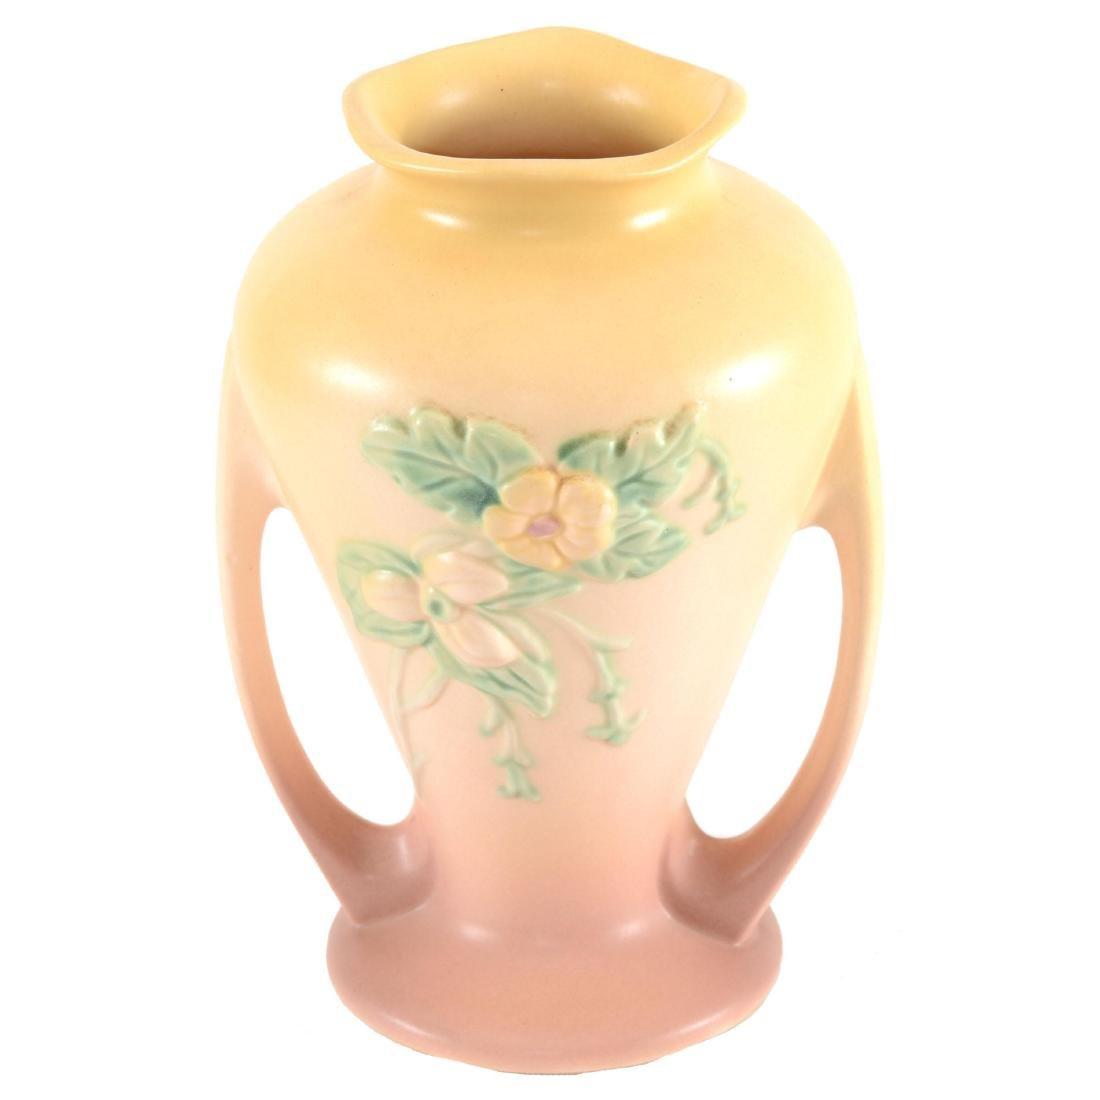 Hull Art Pottery Vase